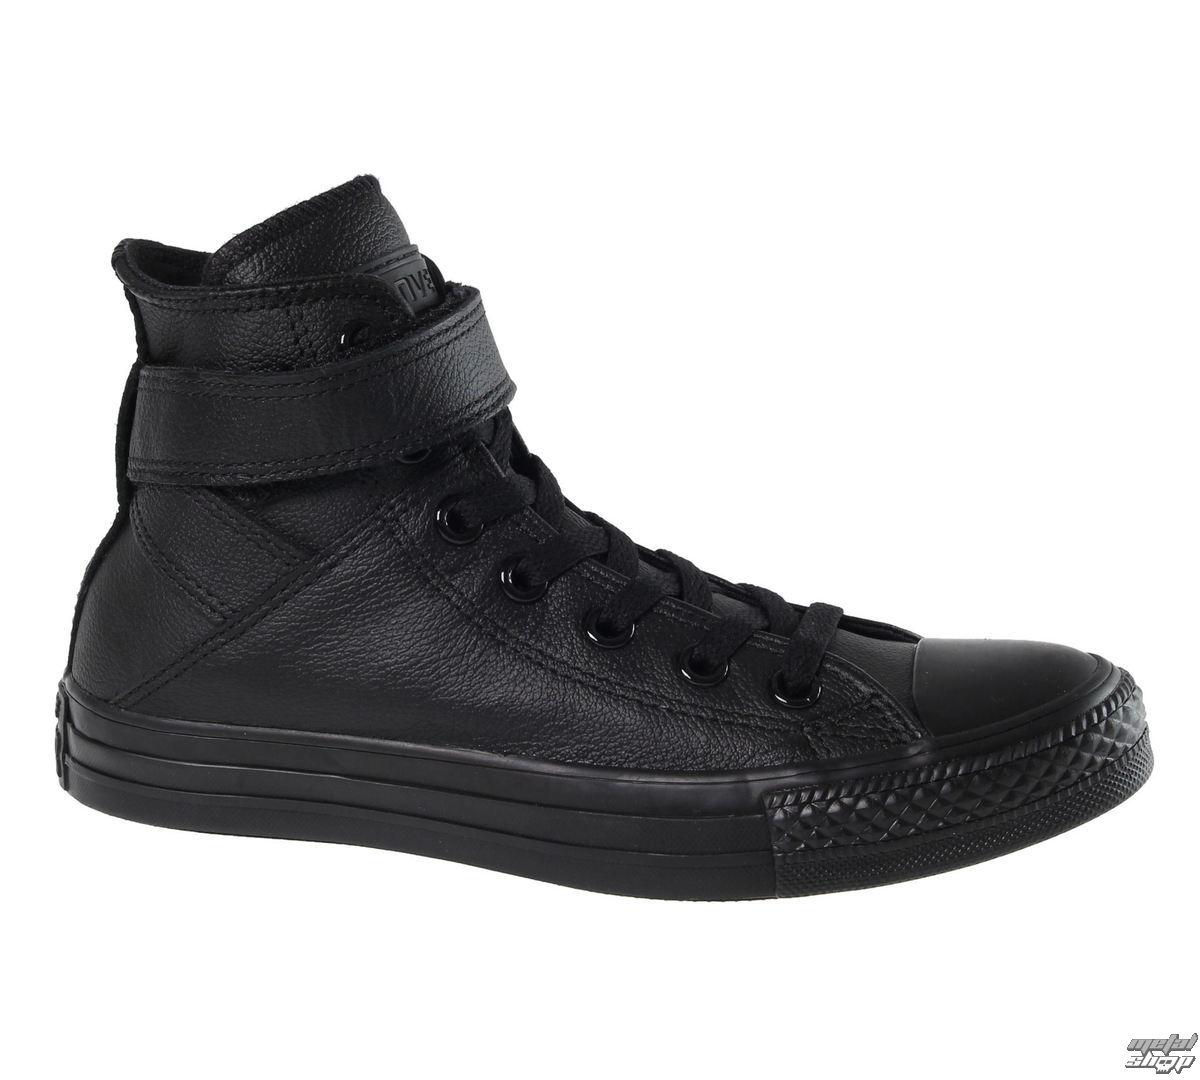 boty dámské CONVERSE - Chuck Taylor AS Brea Leather - C549583